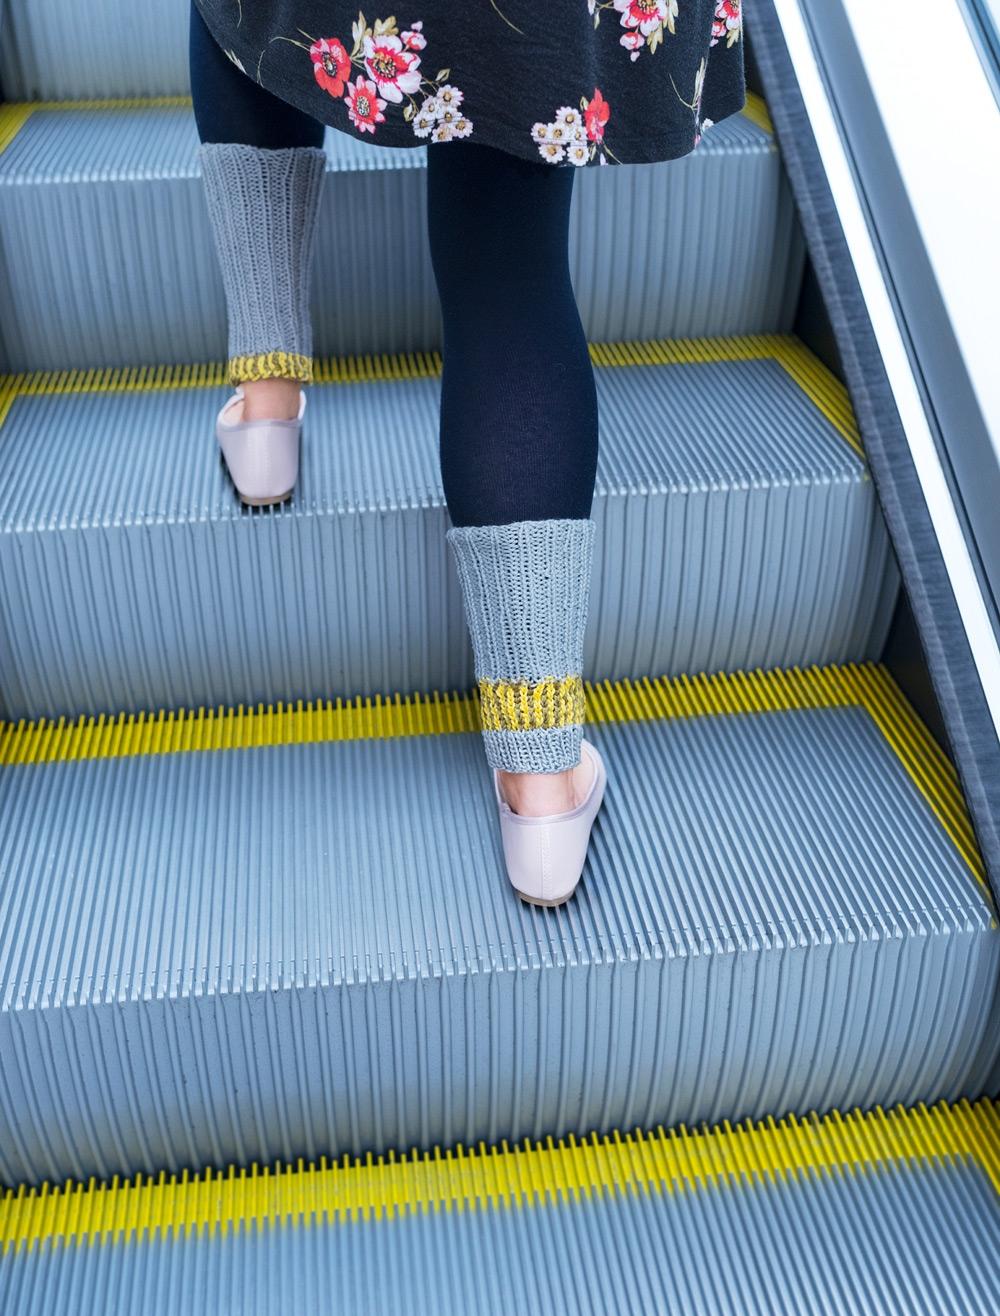 1b1-283 escalator joseph ford 43 Joseph Ford - London